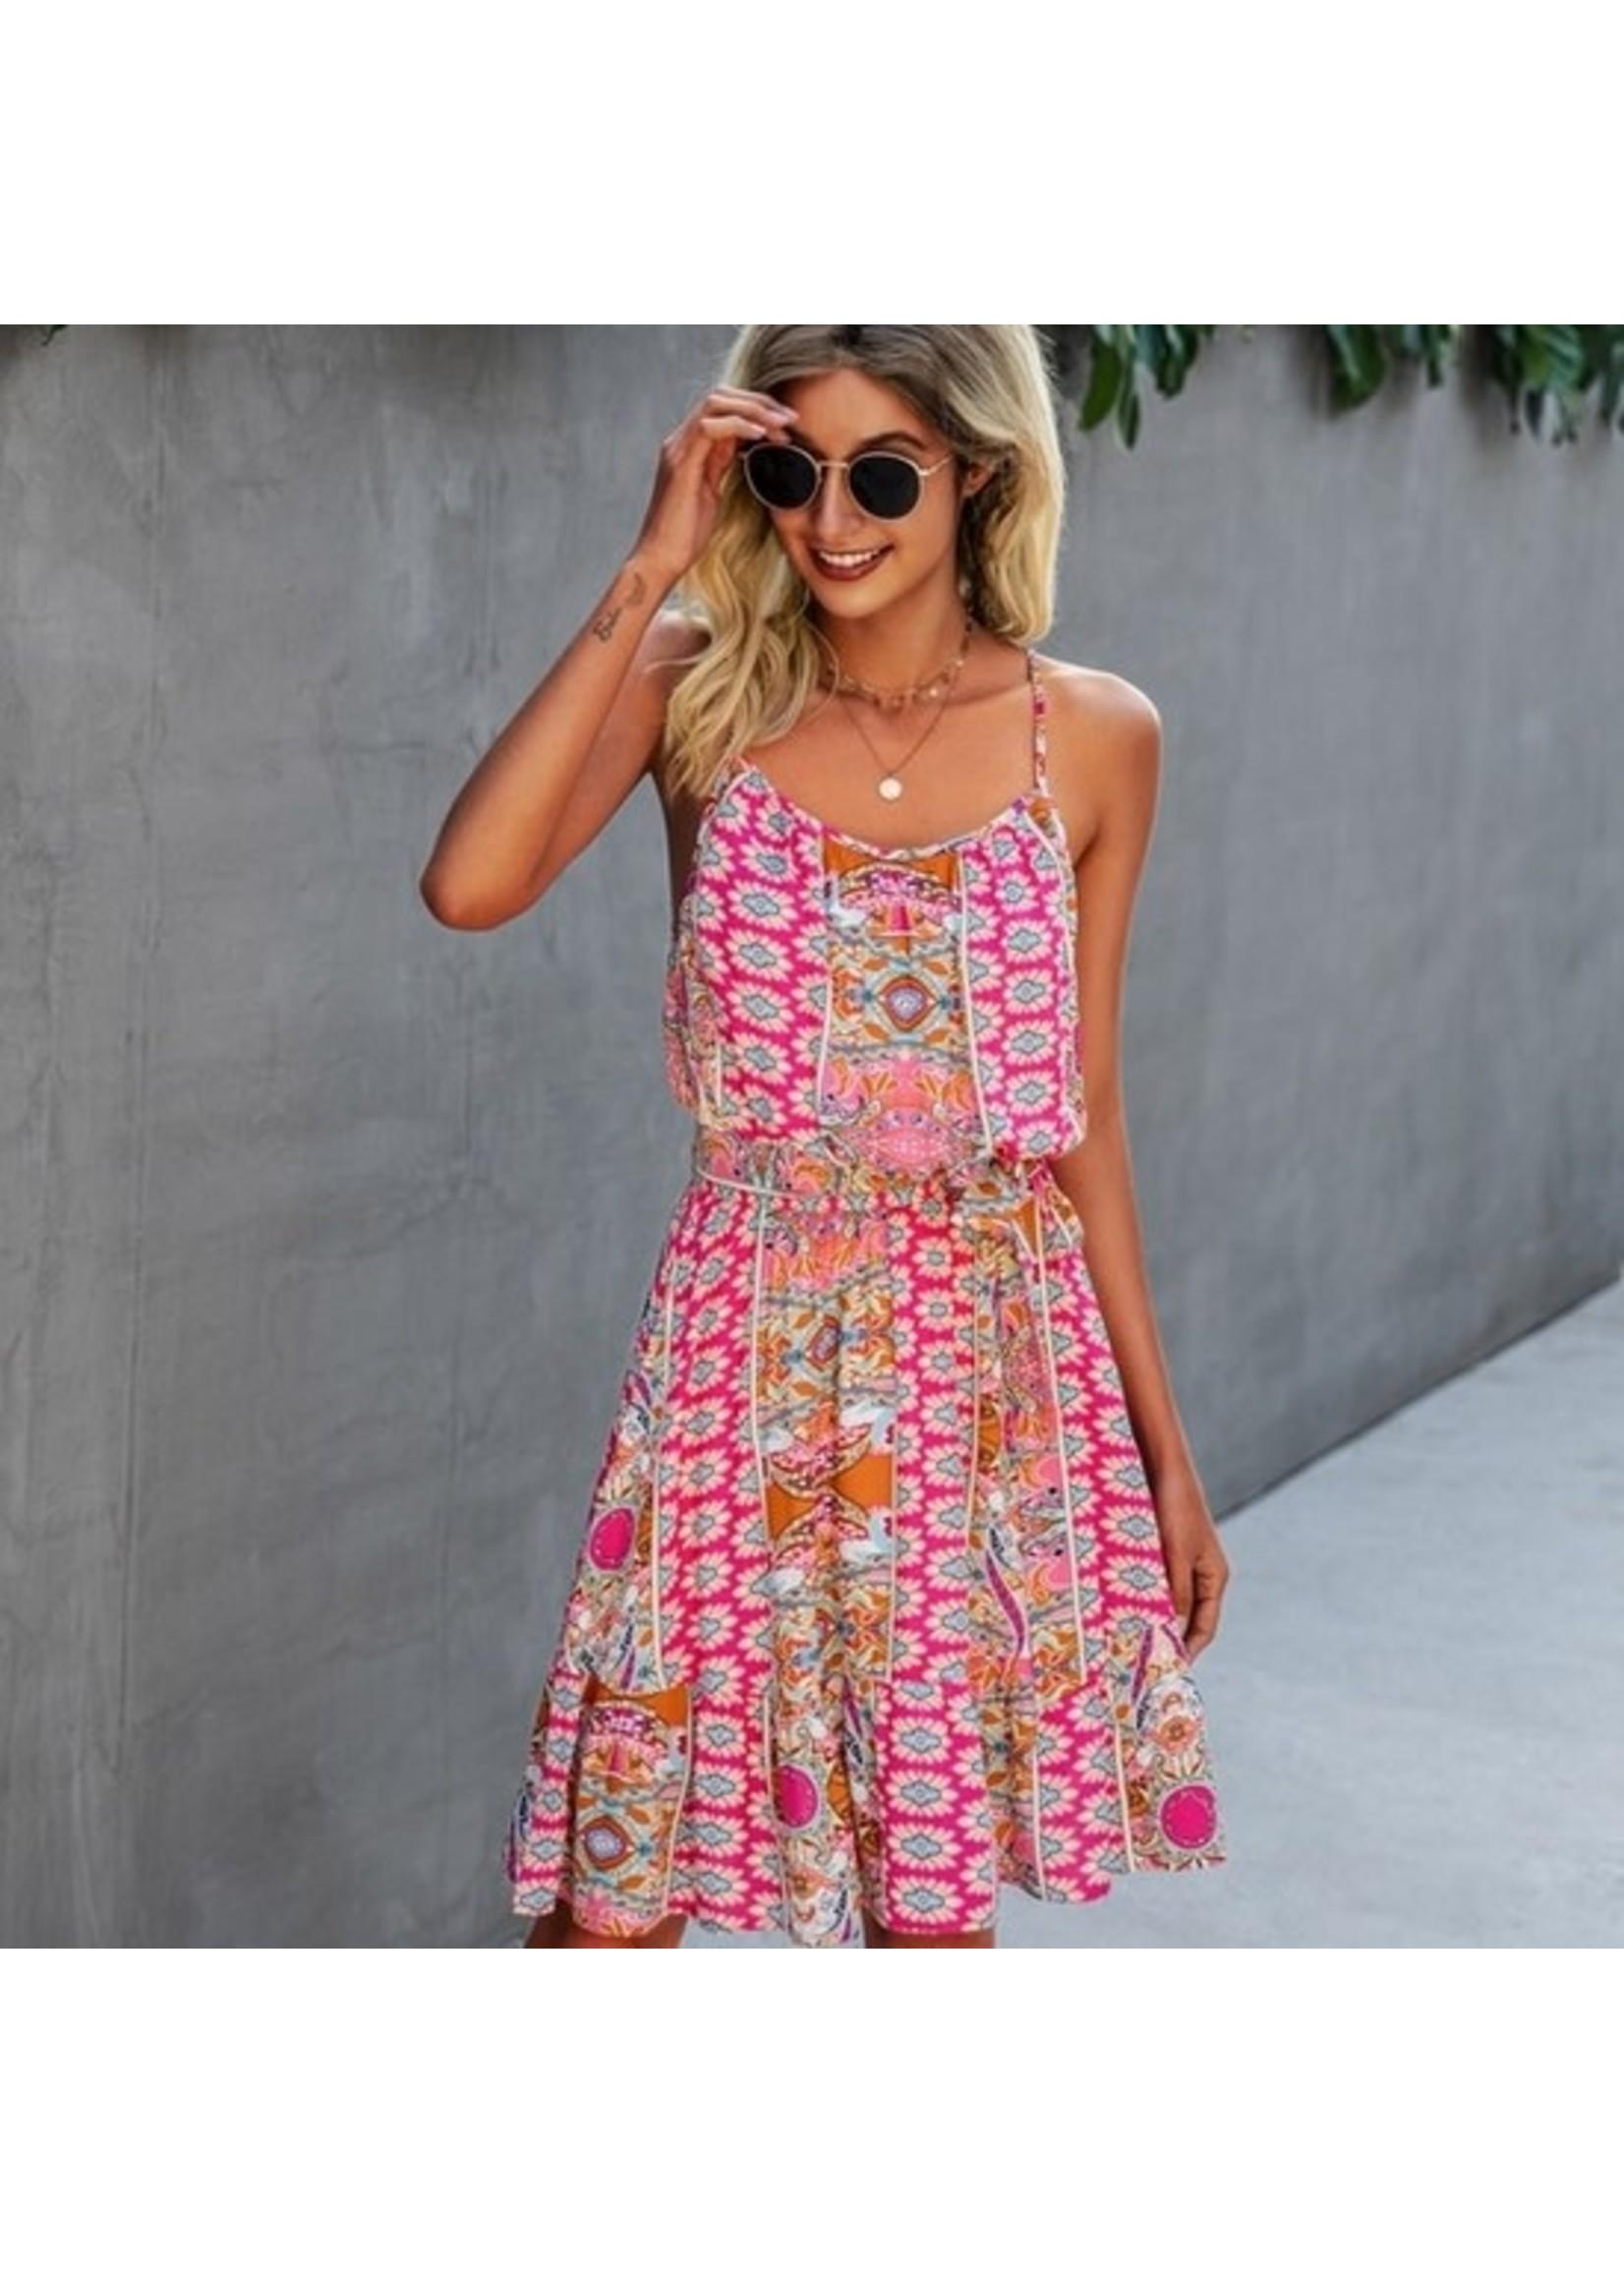 E Pretty Pink printed dress